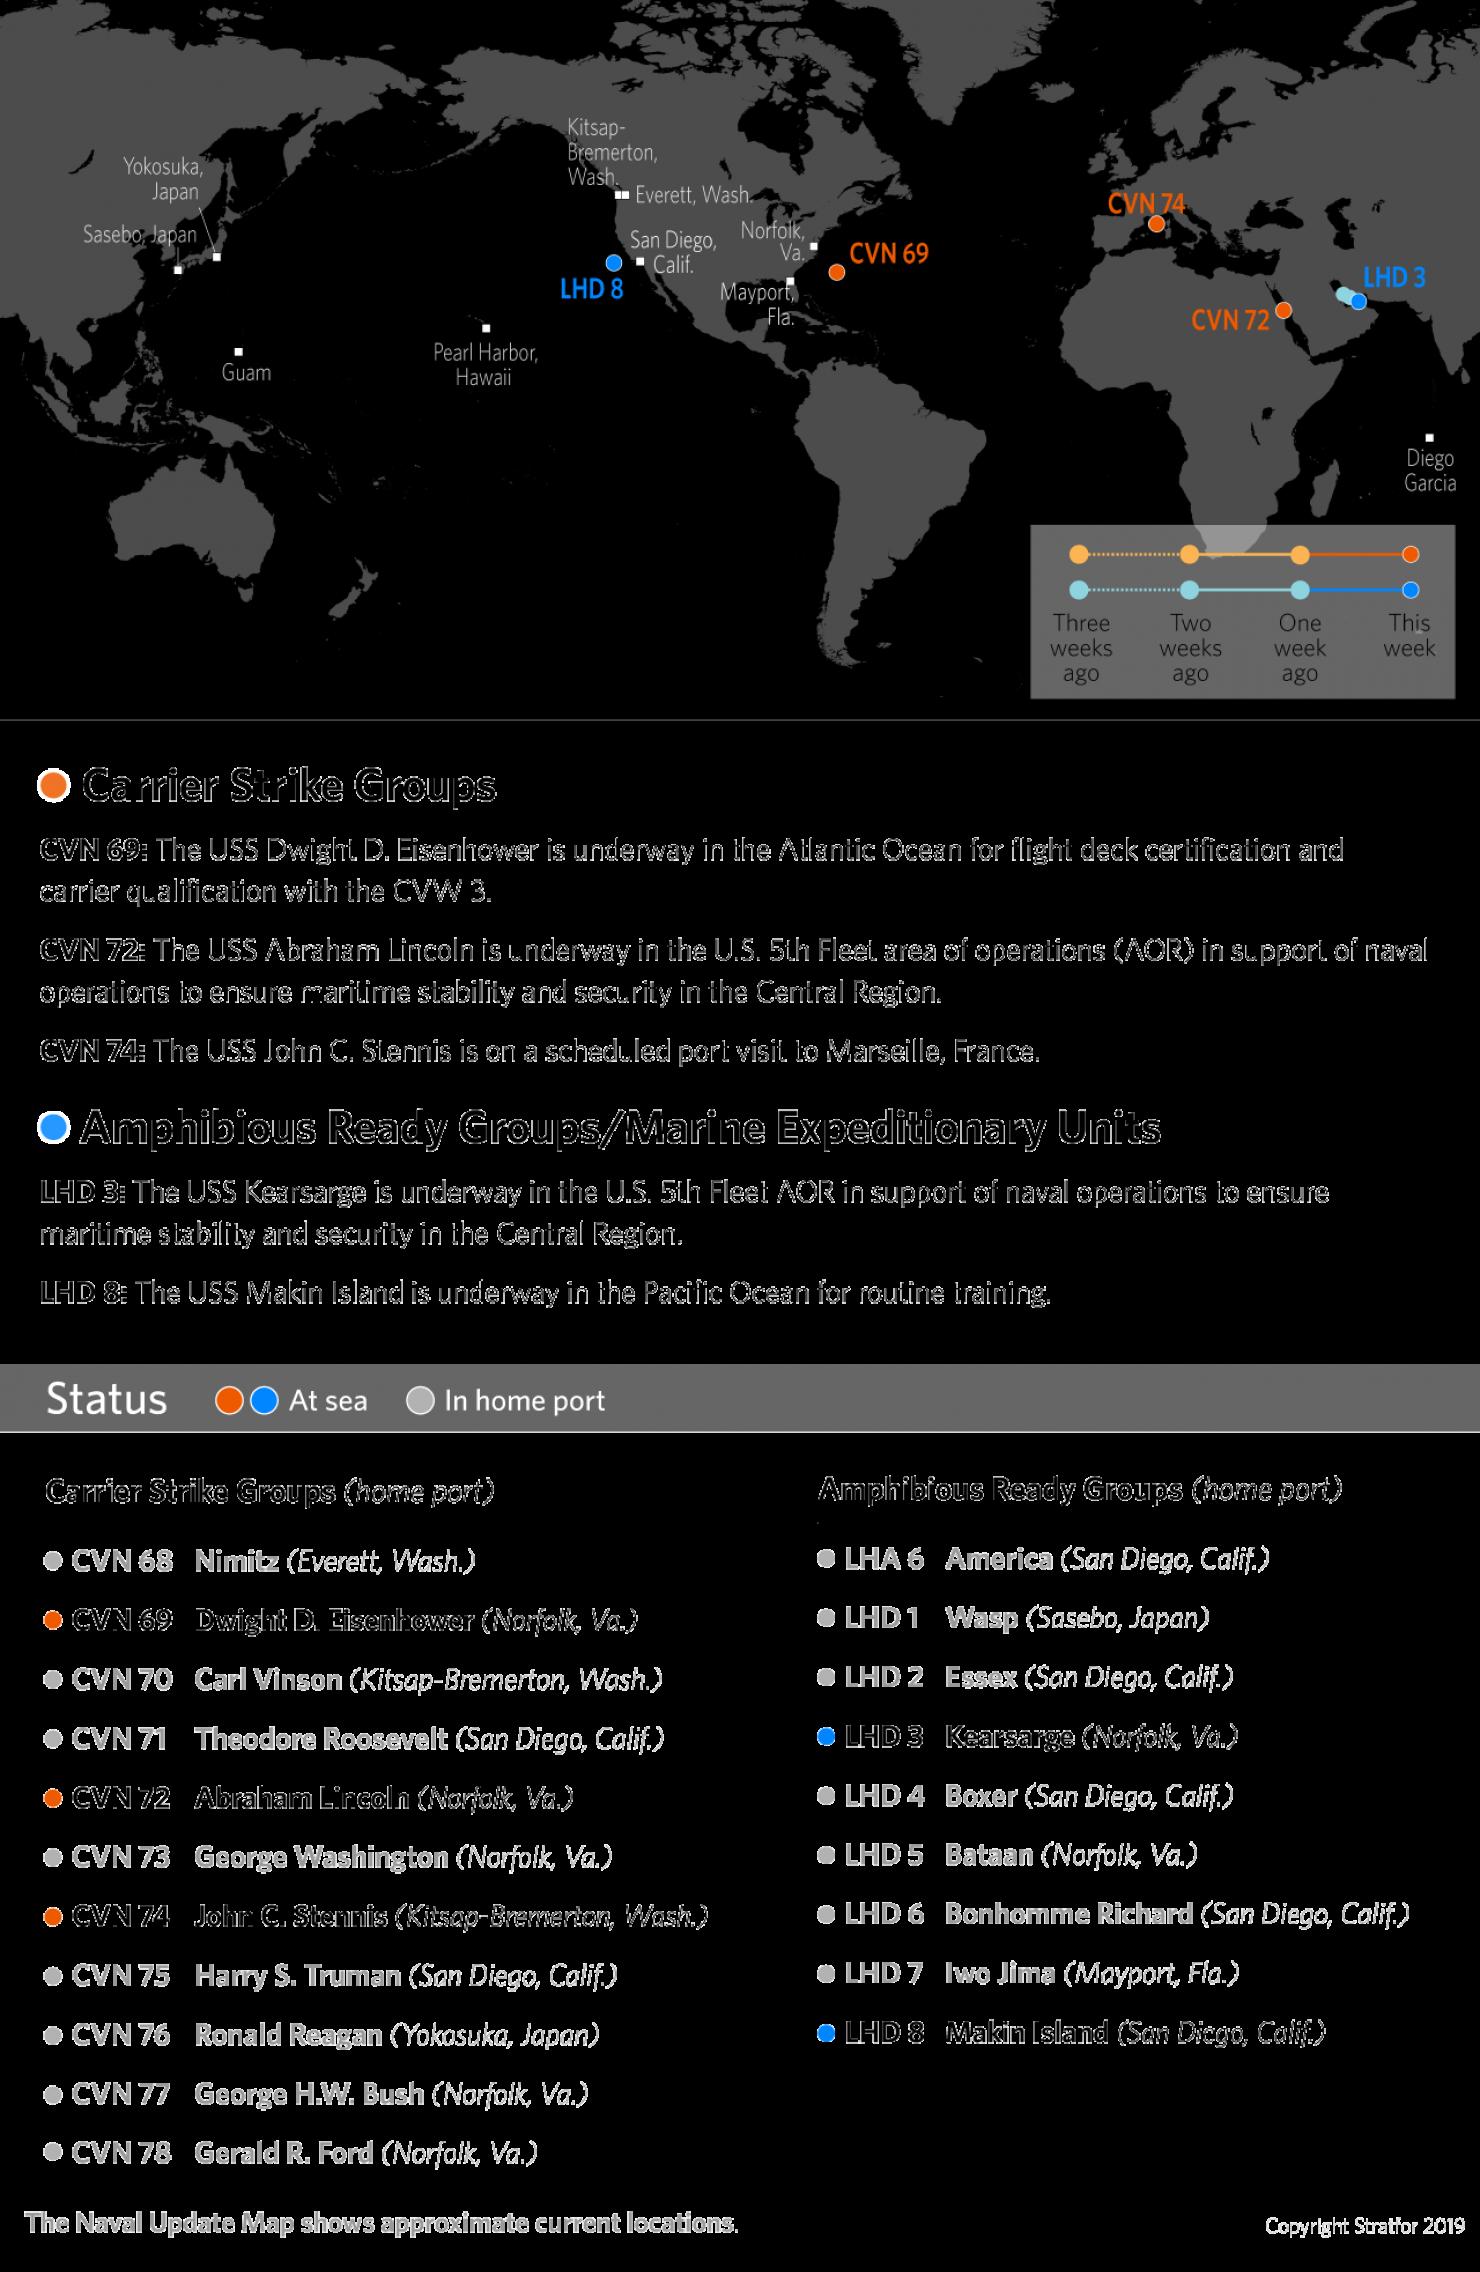 U.S. Naval Update Map: May 2, 2019